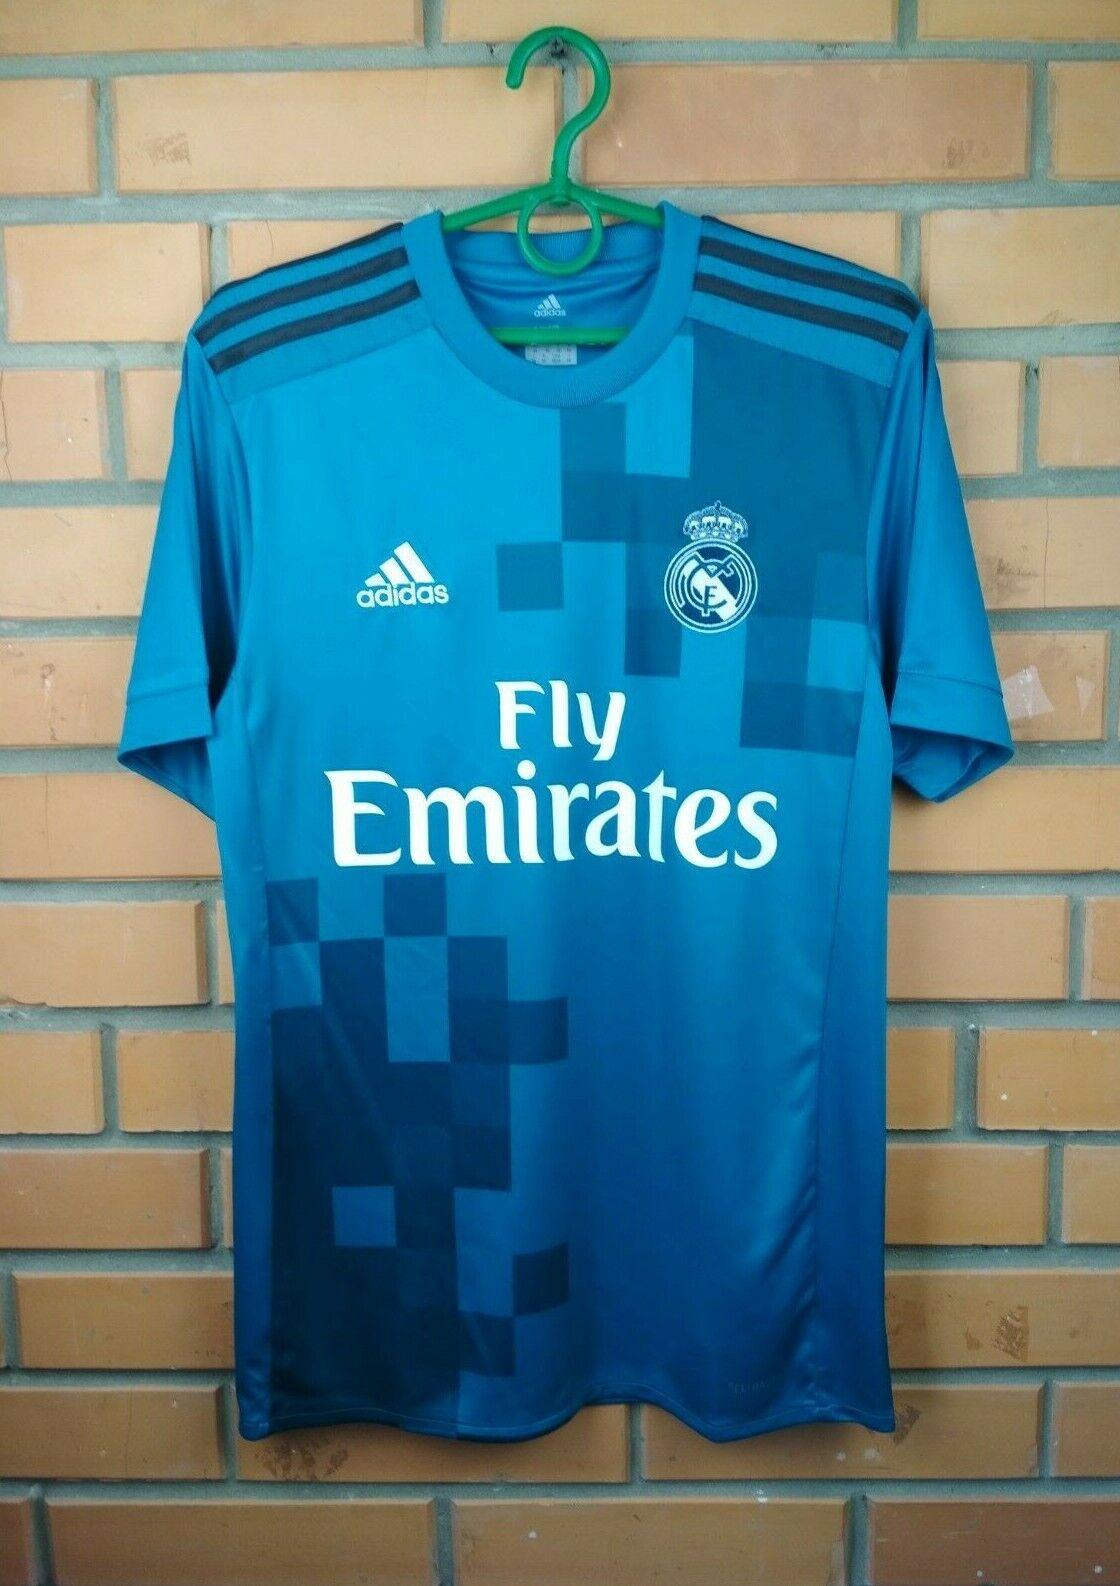 Real Madrid third jersey XS 2017 2018 shirt BR3539 soccer football Adidas